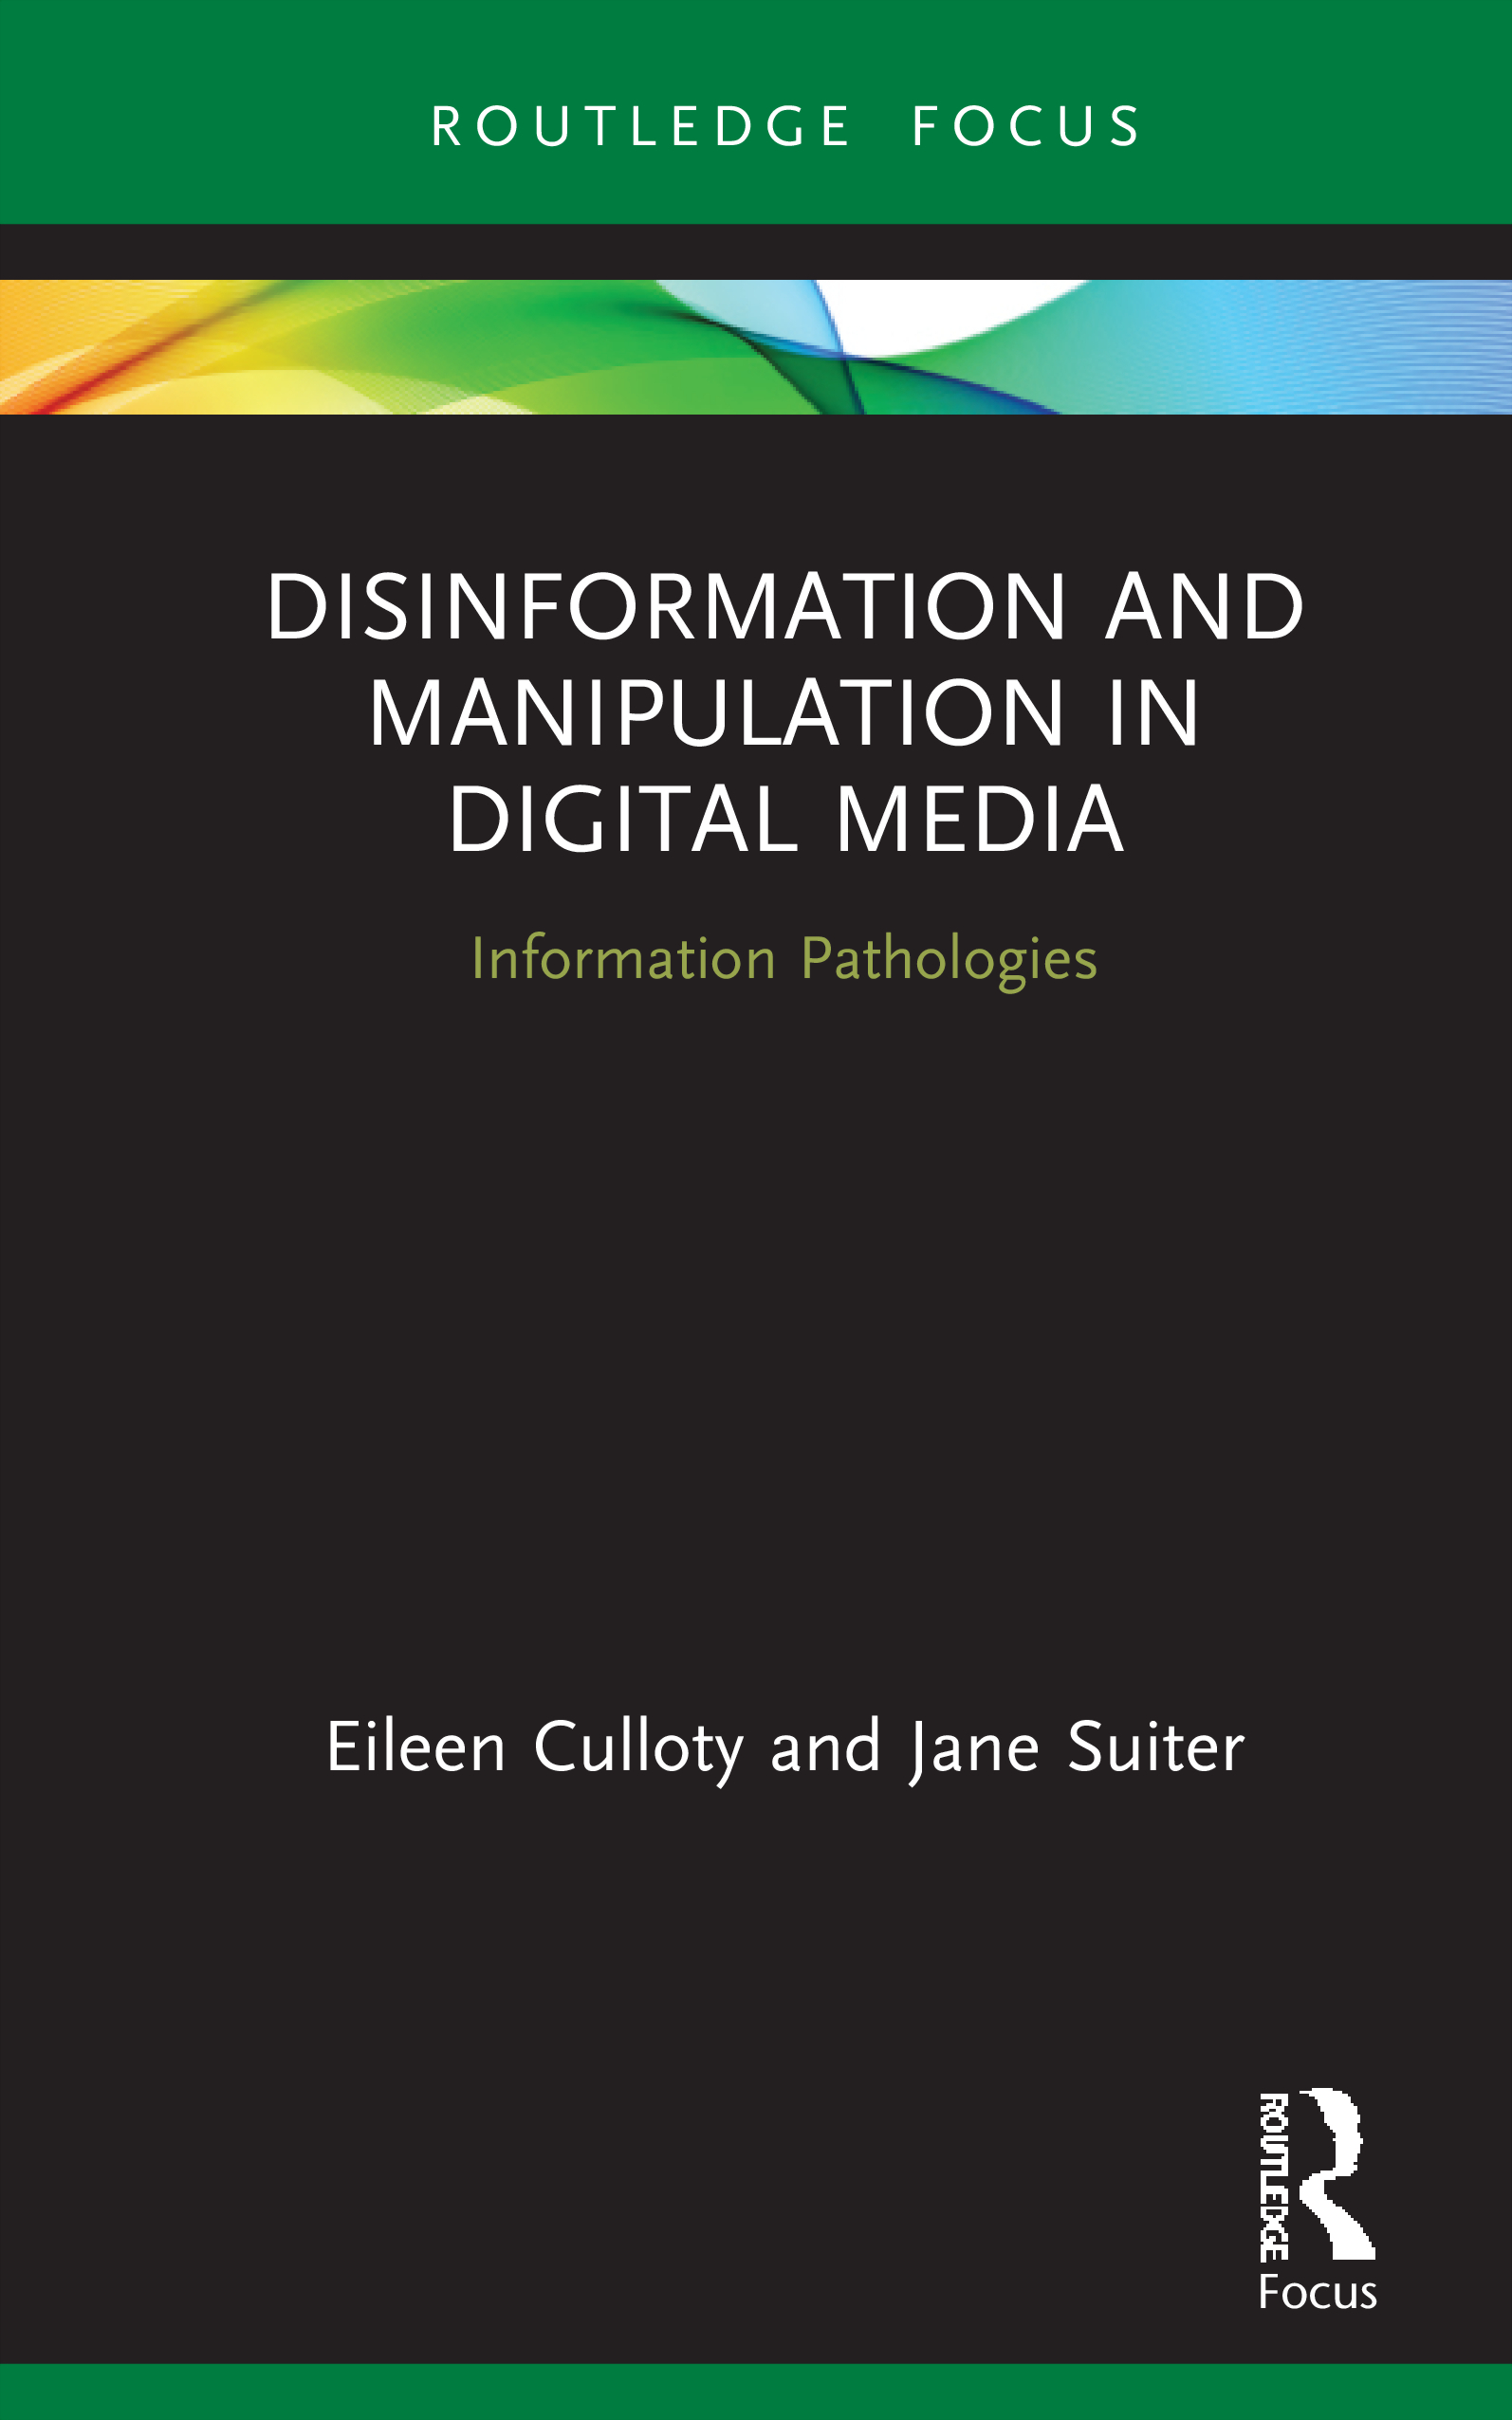 Disinformation and Manipulation in Digital Media